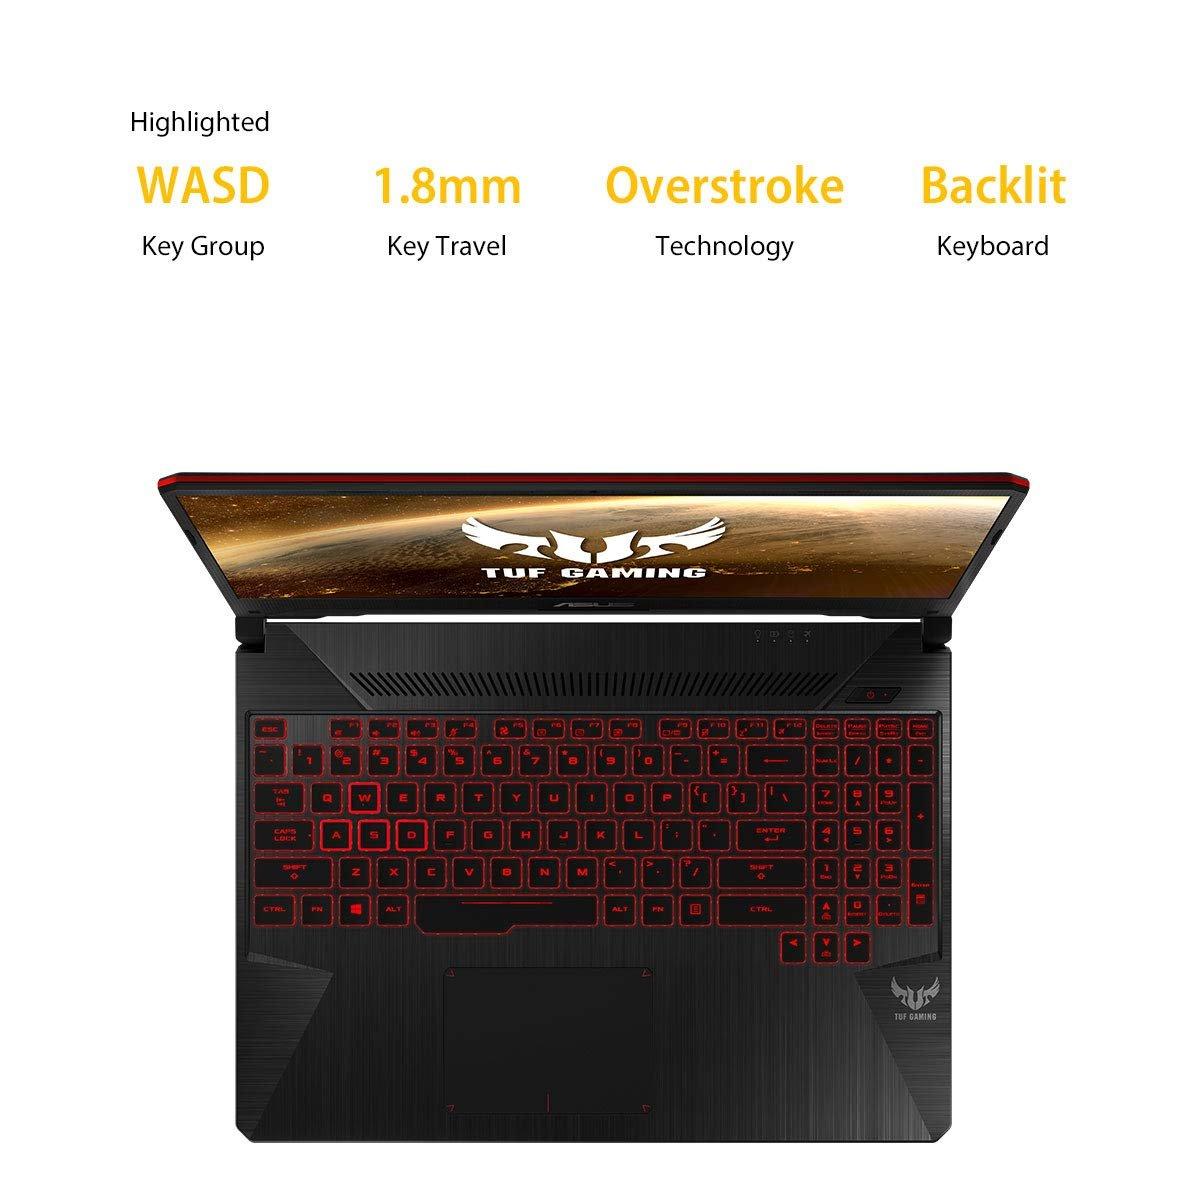 ASUS-TUF-Gaming-FX505DY-BQ024T-15.6-inch-FHD-Laptop